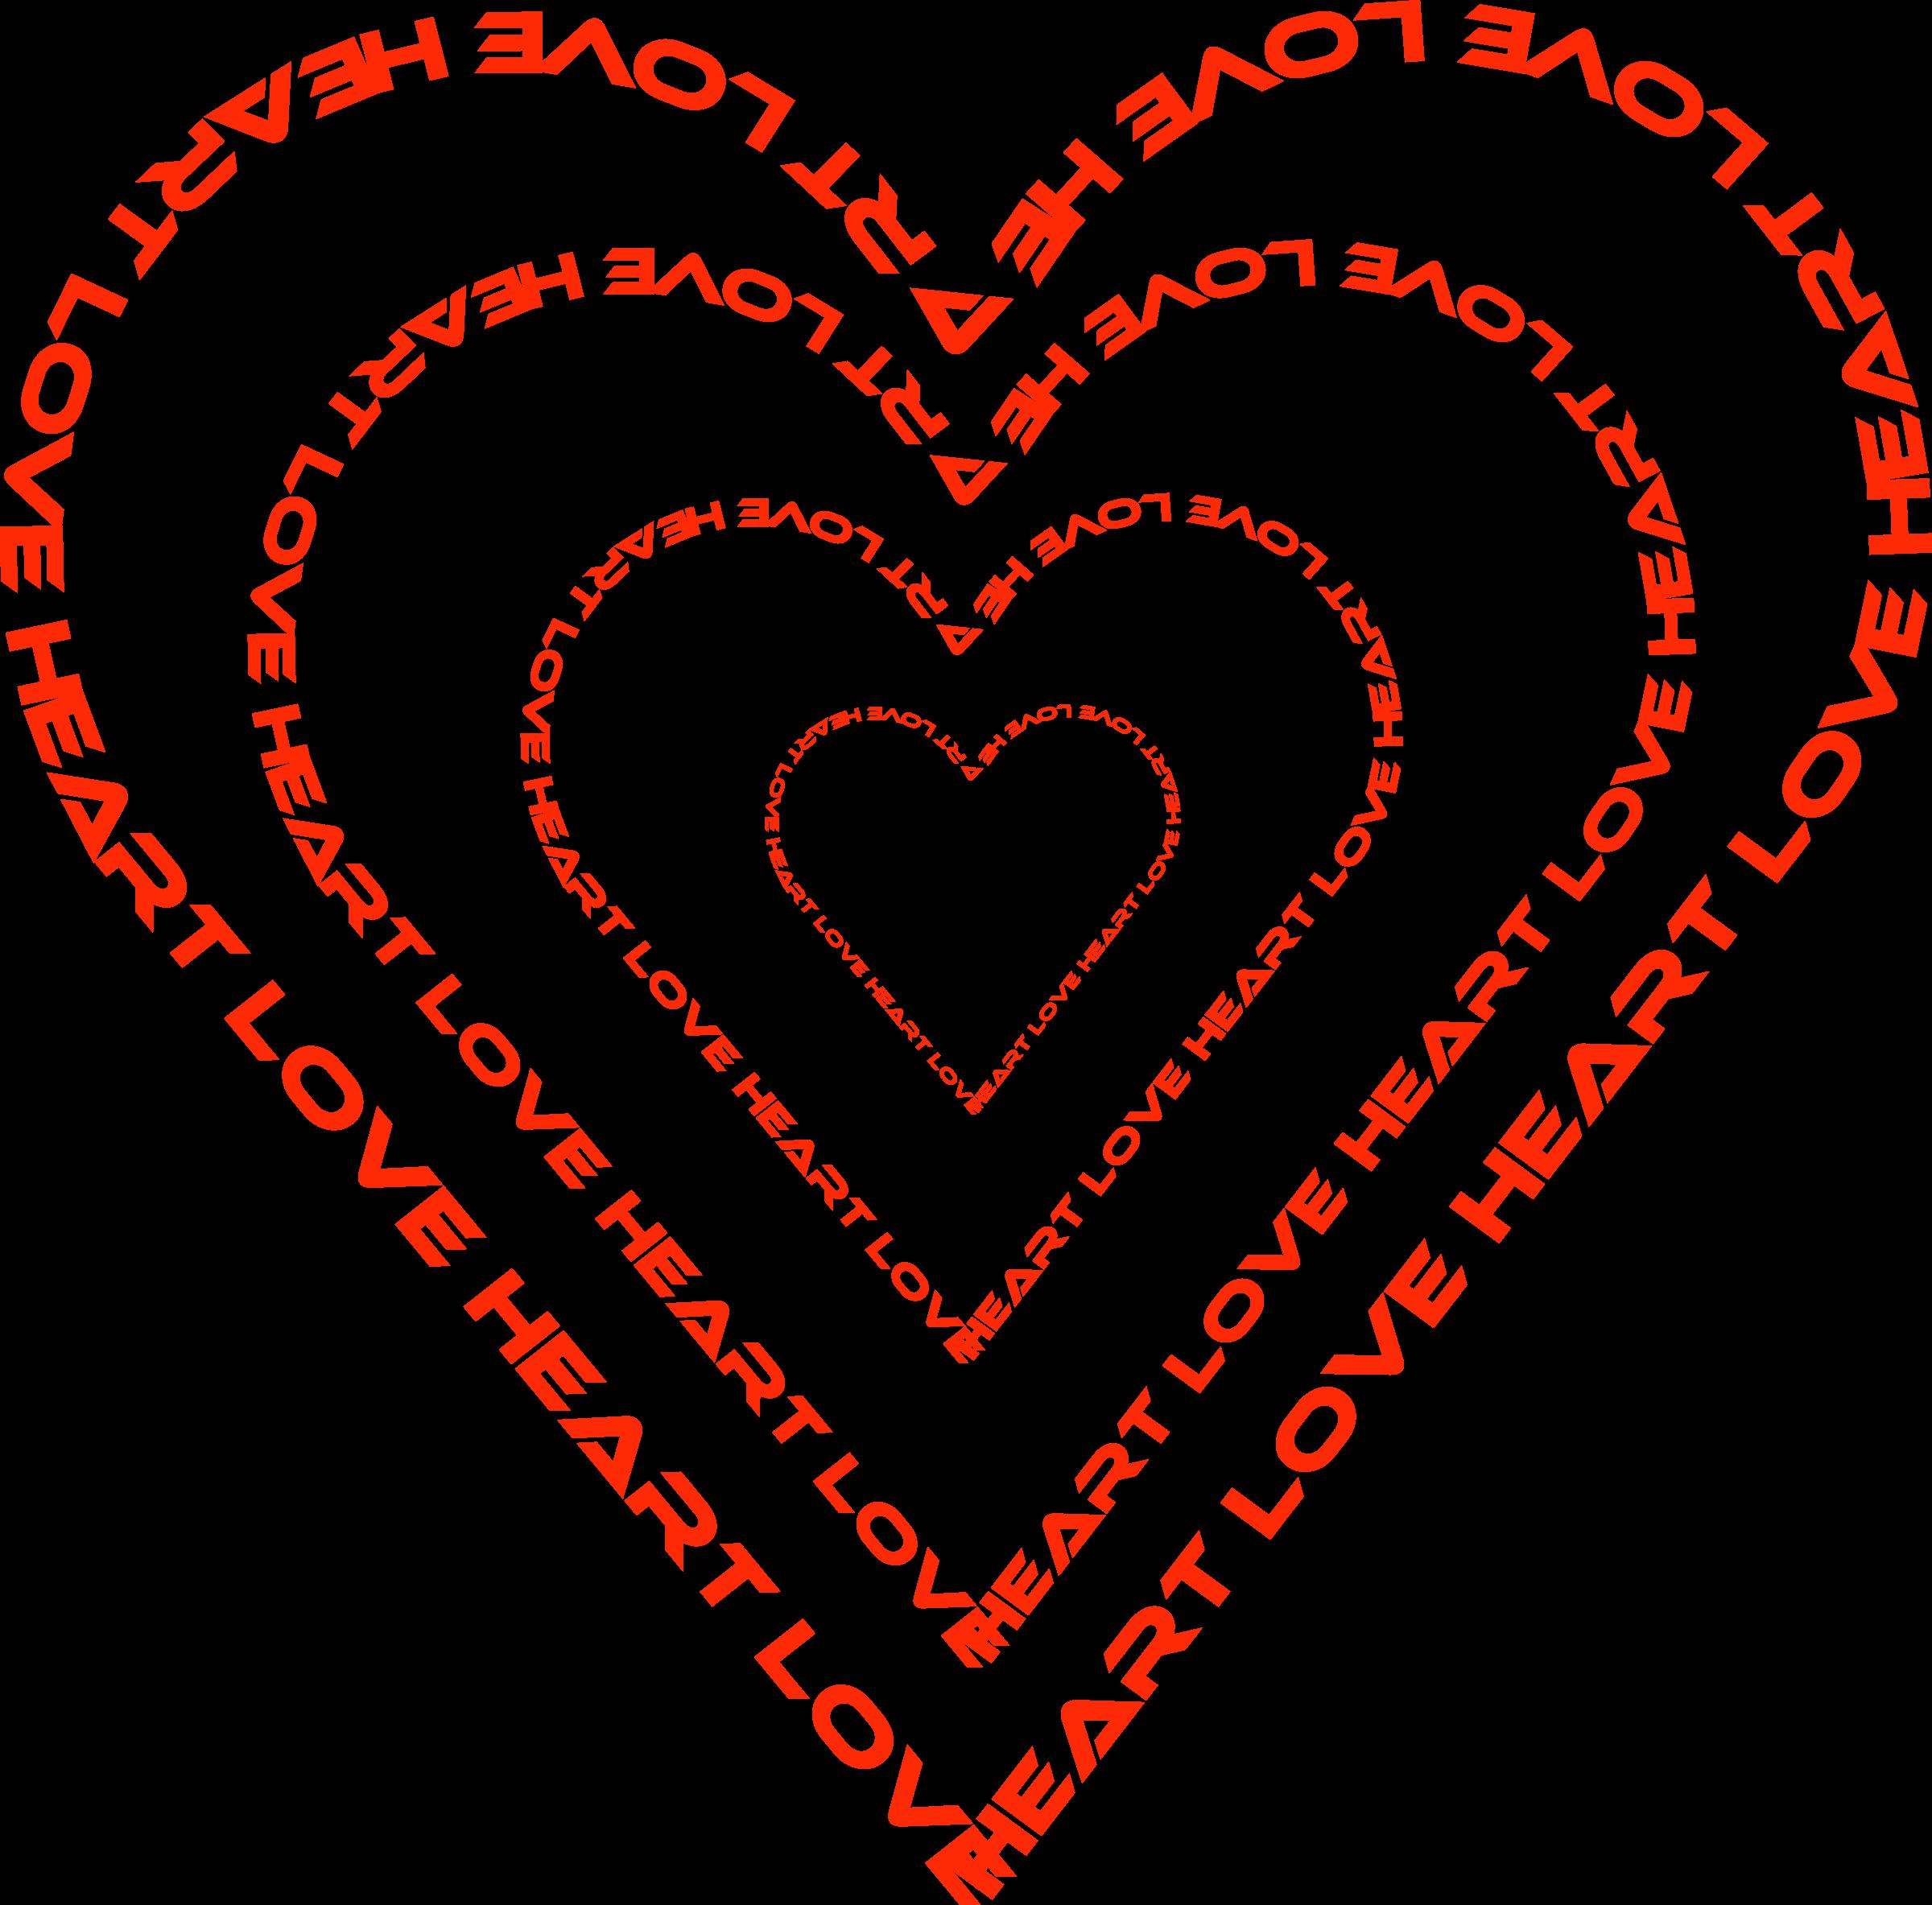 Clipart heart outline talk clipart stock Clipart - A Heart done by words outline clipart stock